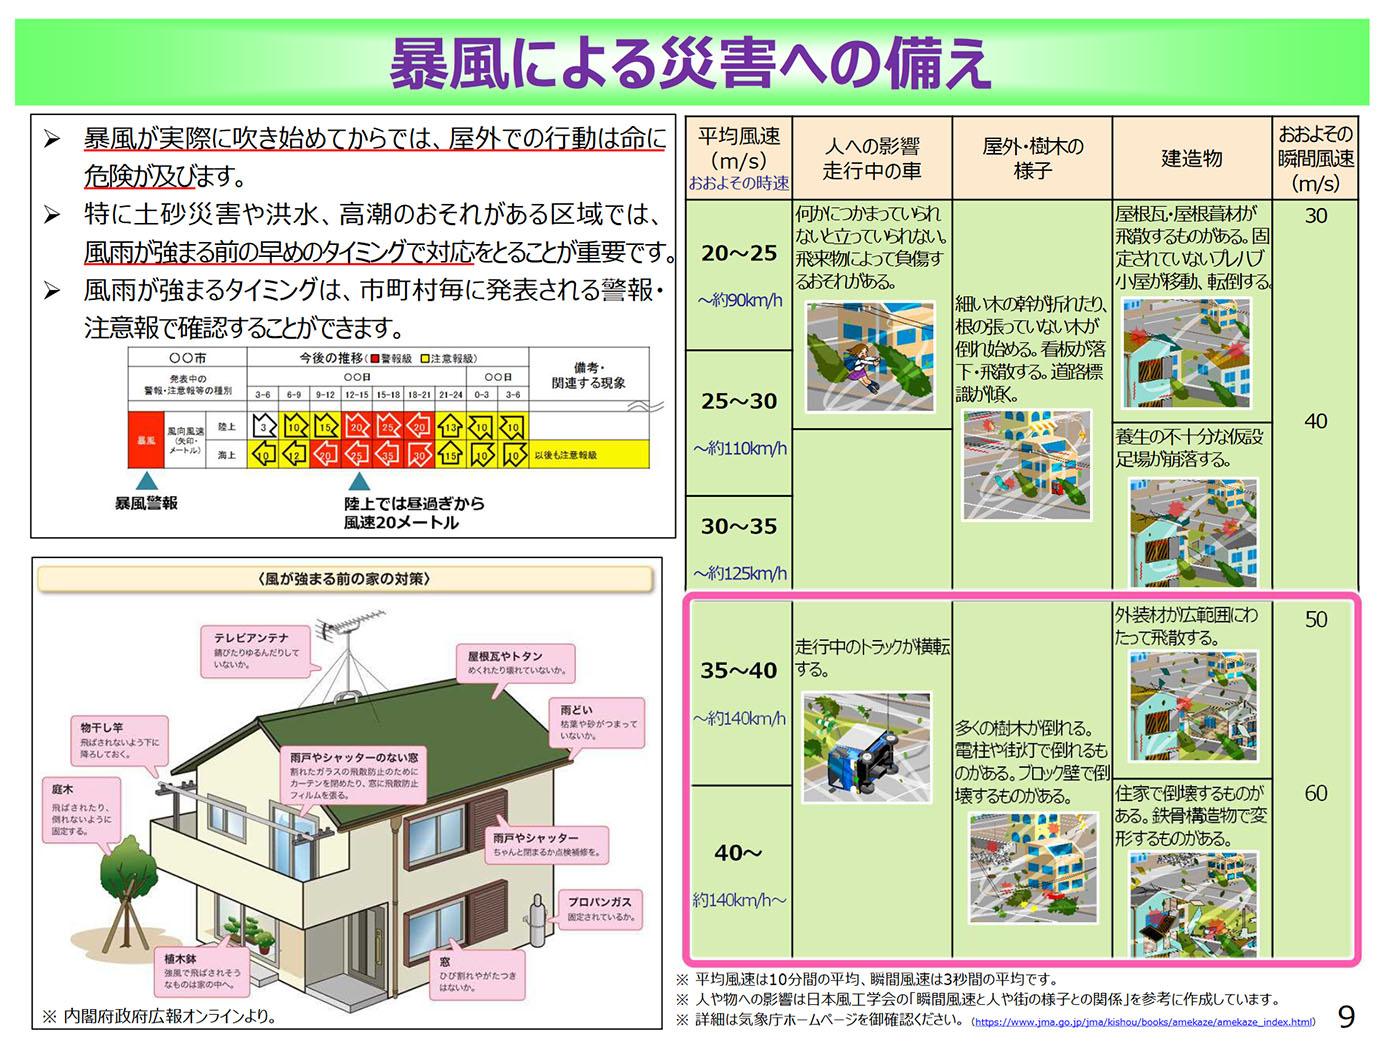 typhoon-emergency-evacuation-news4